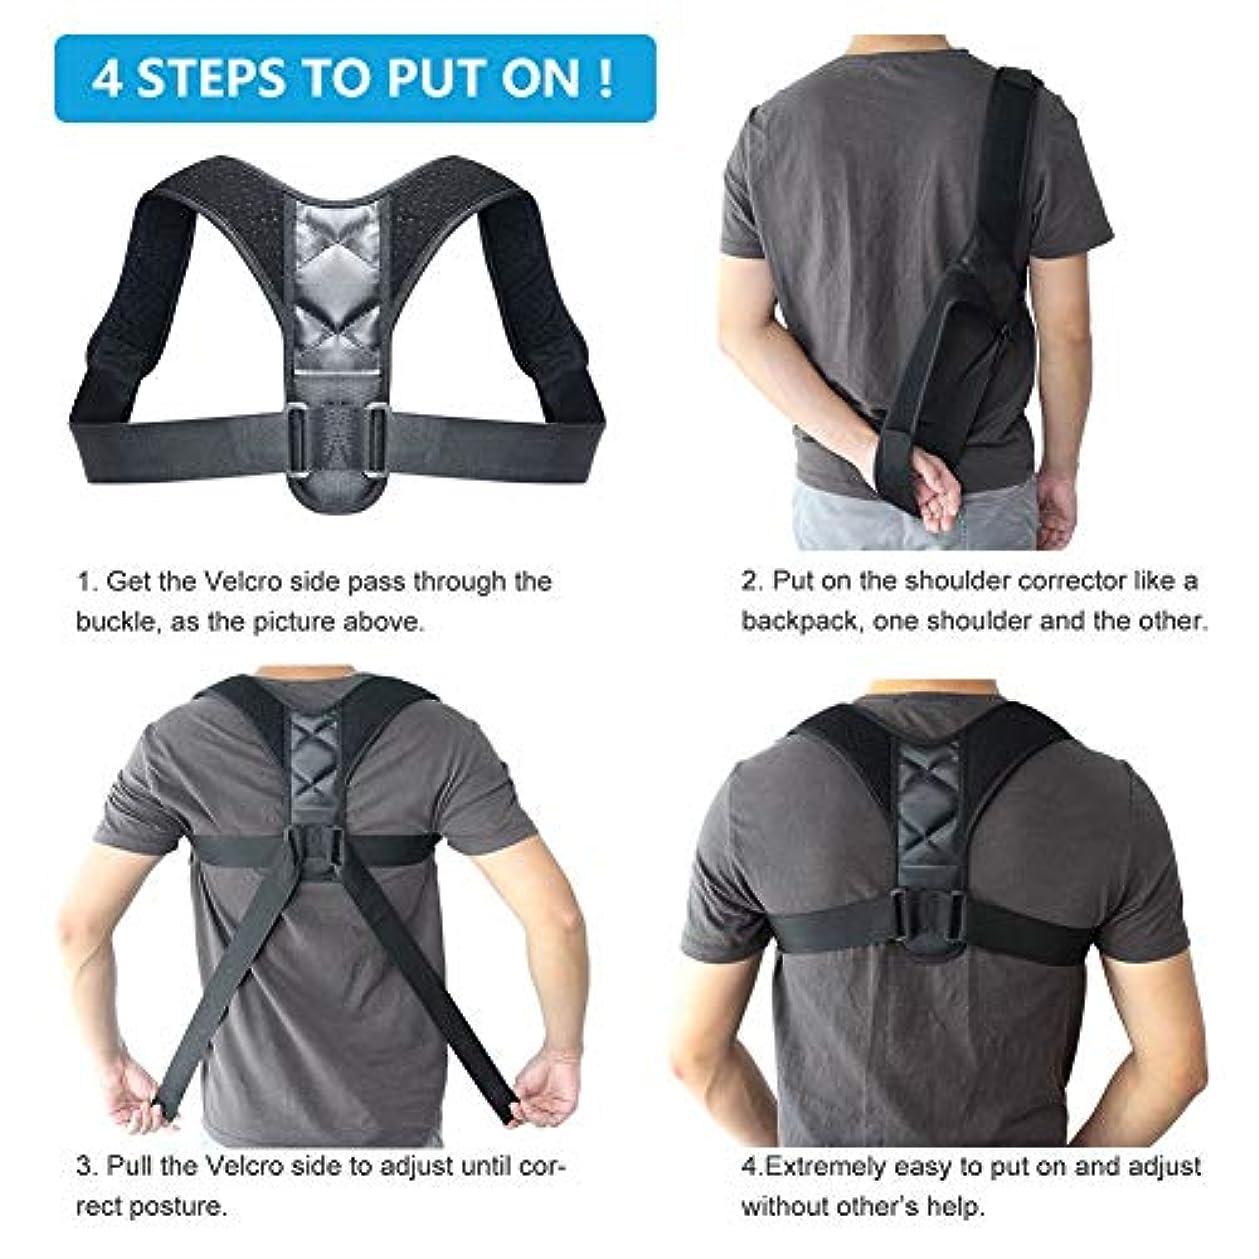 DZSW 弾性姿勢補正器装具肩サポート調整可能な背部矯正ベルト背部矯正ベルト肩サポートベルト健康を改善する (Color : Black, Size : L)